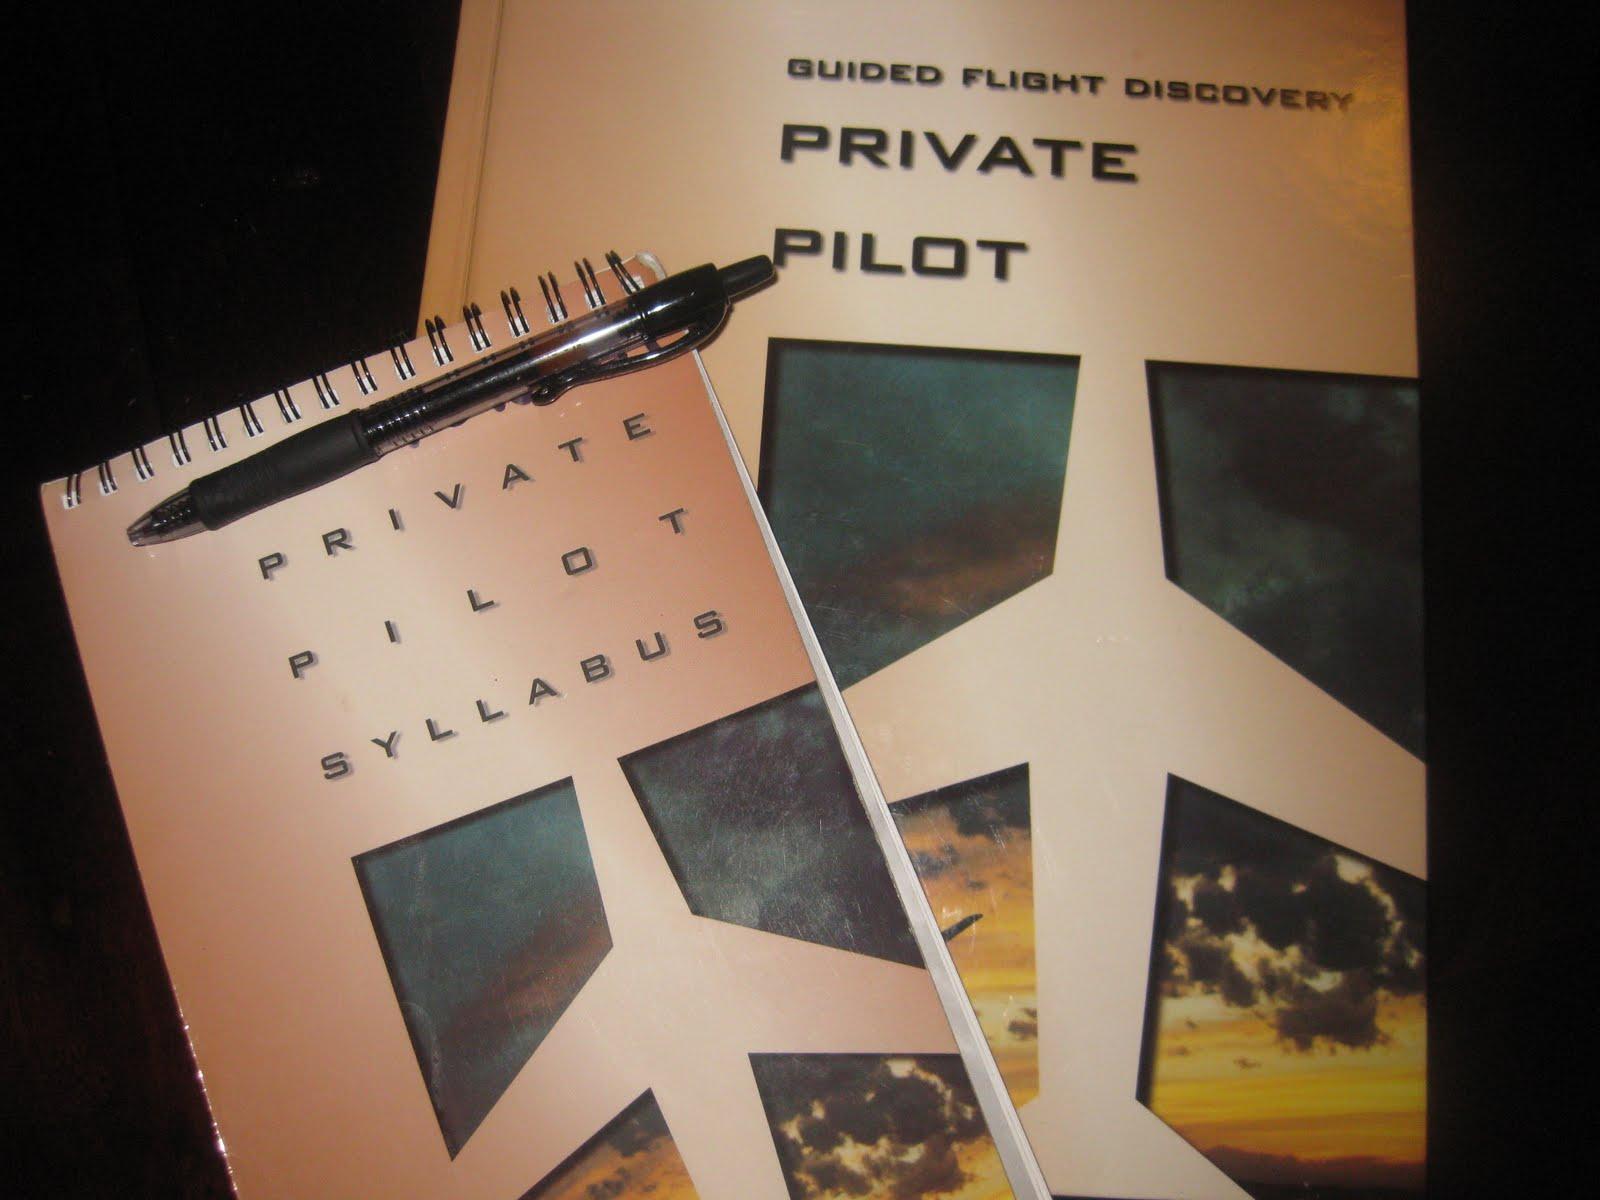 private pilot ground notes Private pilot ground school online syllabus 117 myrtlewood dr • guyton, ga 31312 phone 912-728-8651 • fax 912-728-8651 wwwaviationonlinetrainingnet.